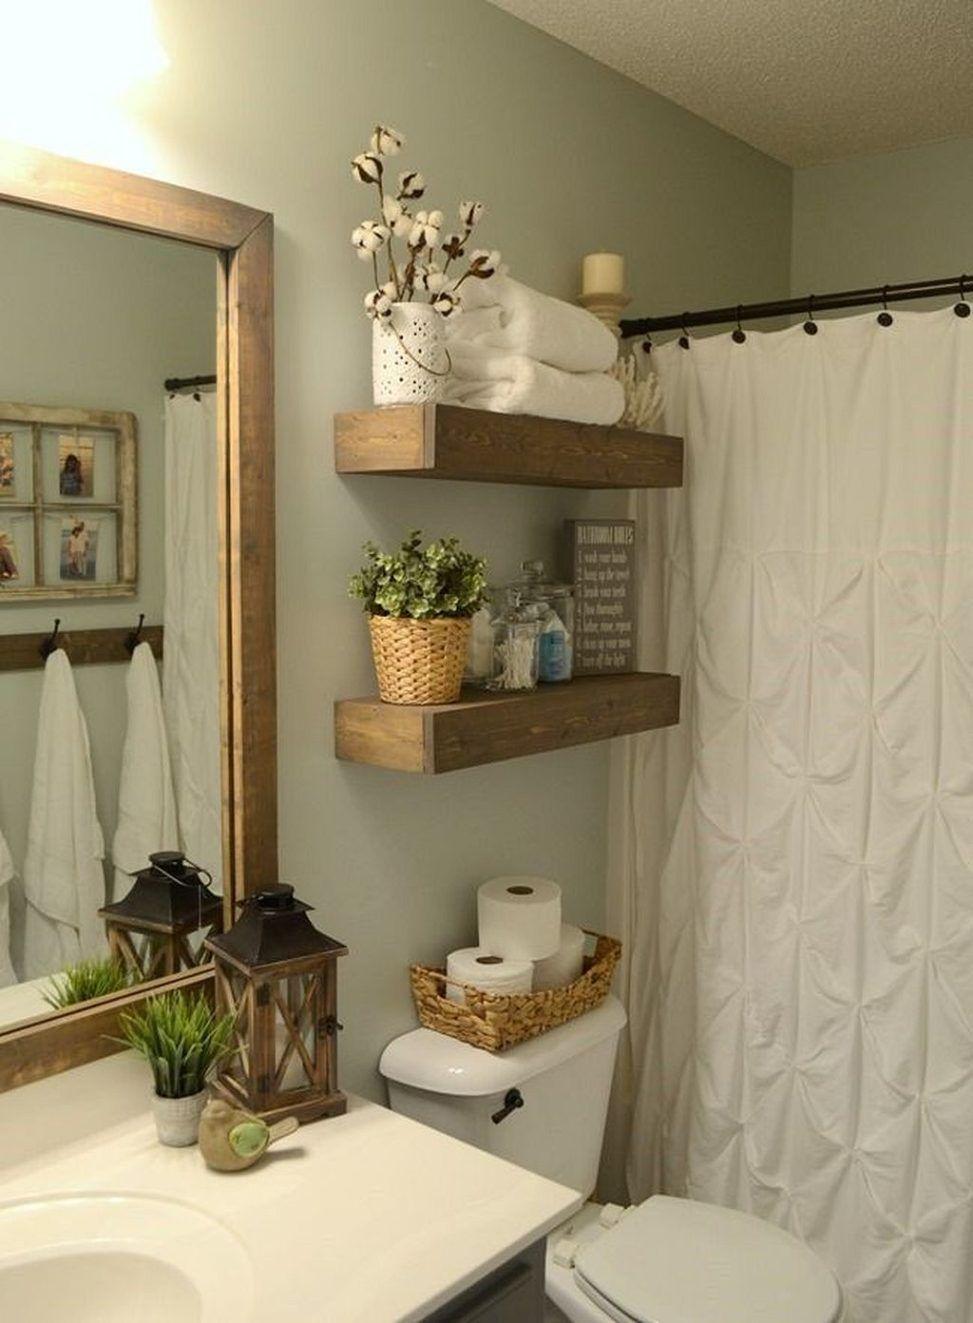 Classy DIY Home Decor Rustic Ideas In 2018 21